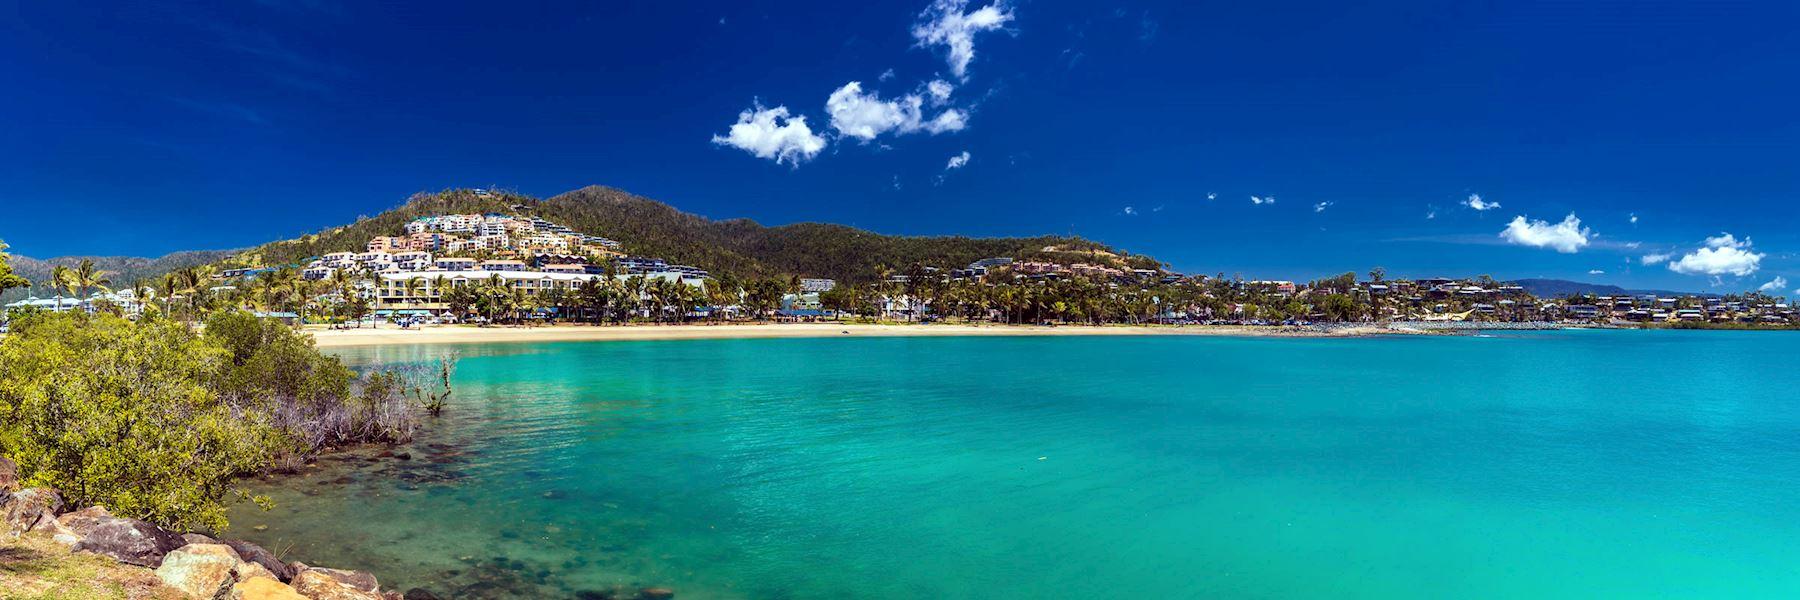 Visit Airlie Beach, Australia